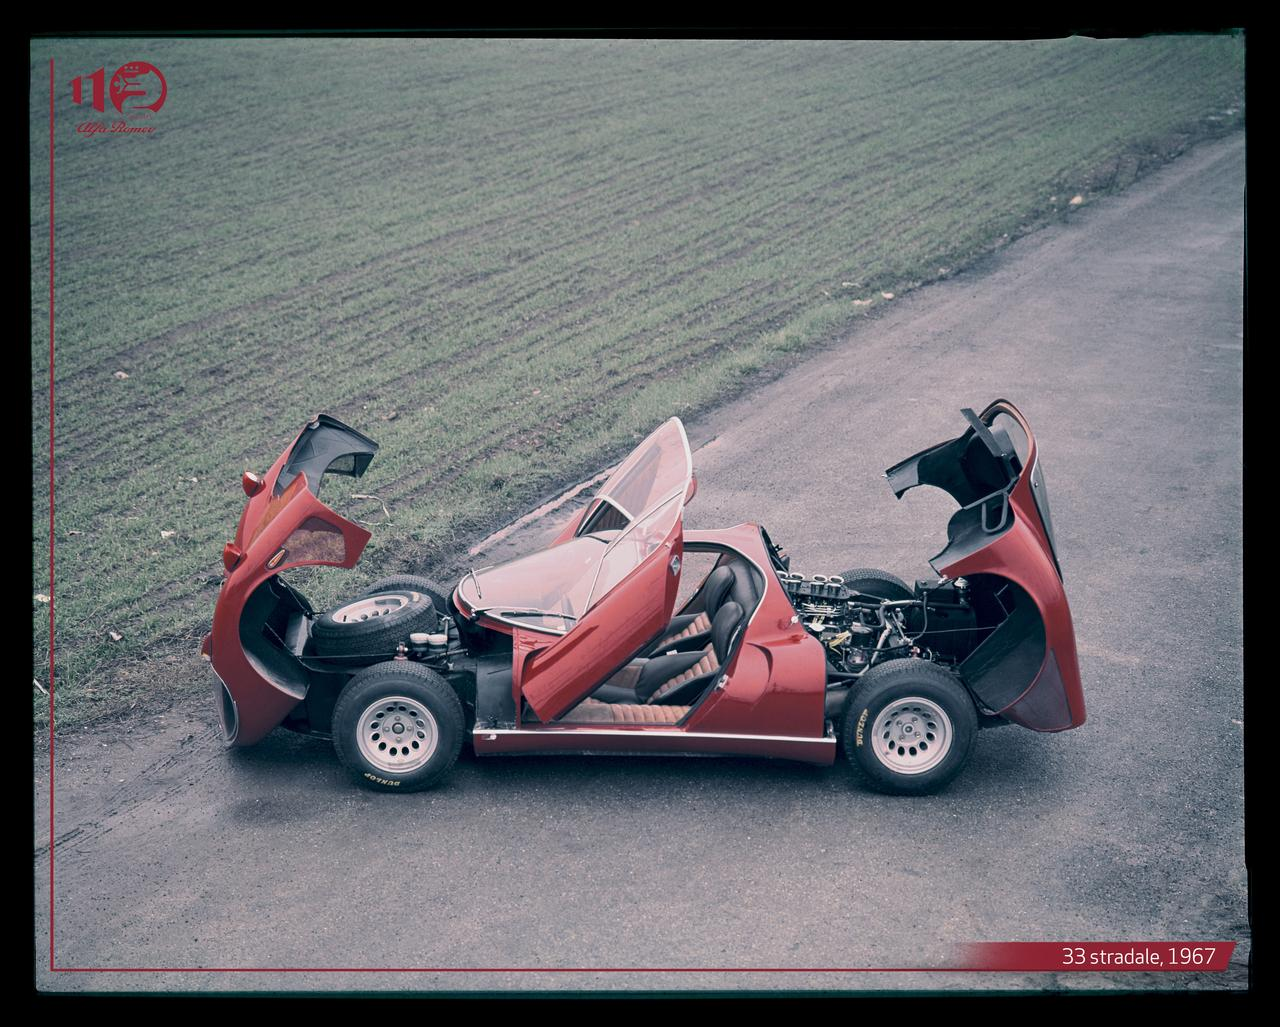 rsz_33-stradale-1967_3.jpg